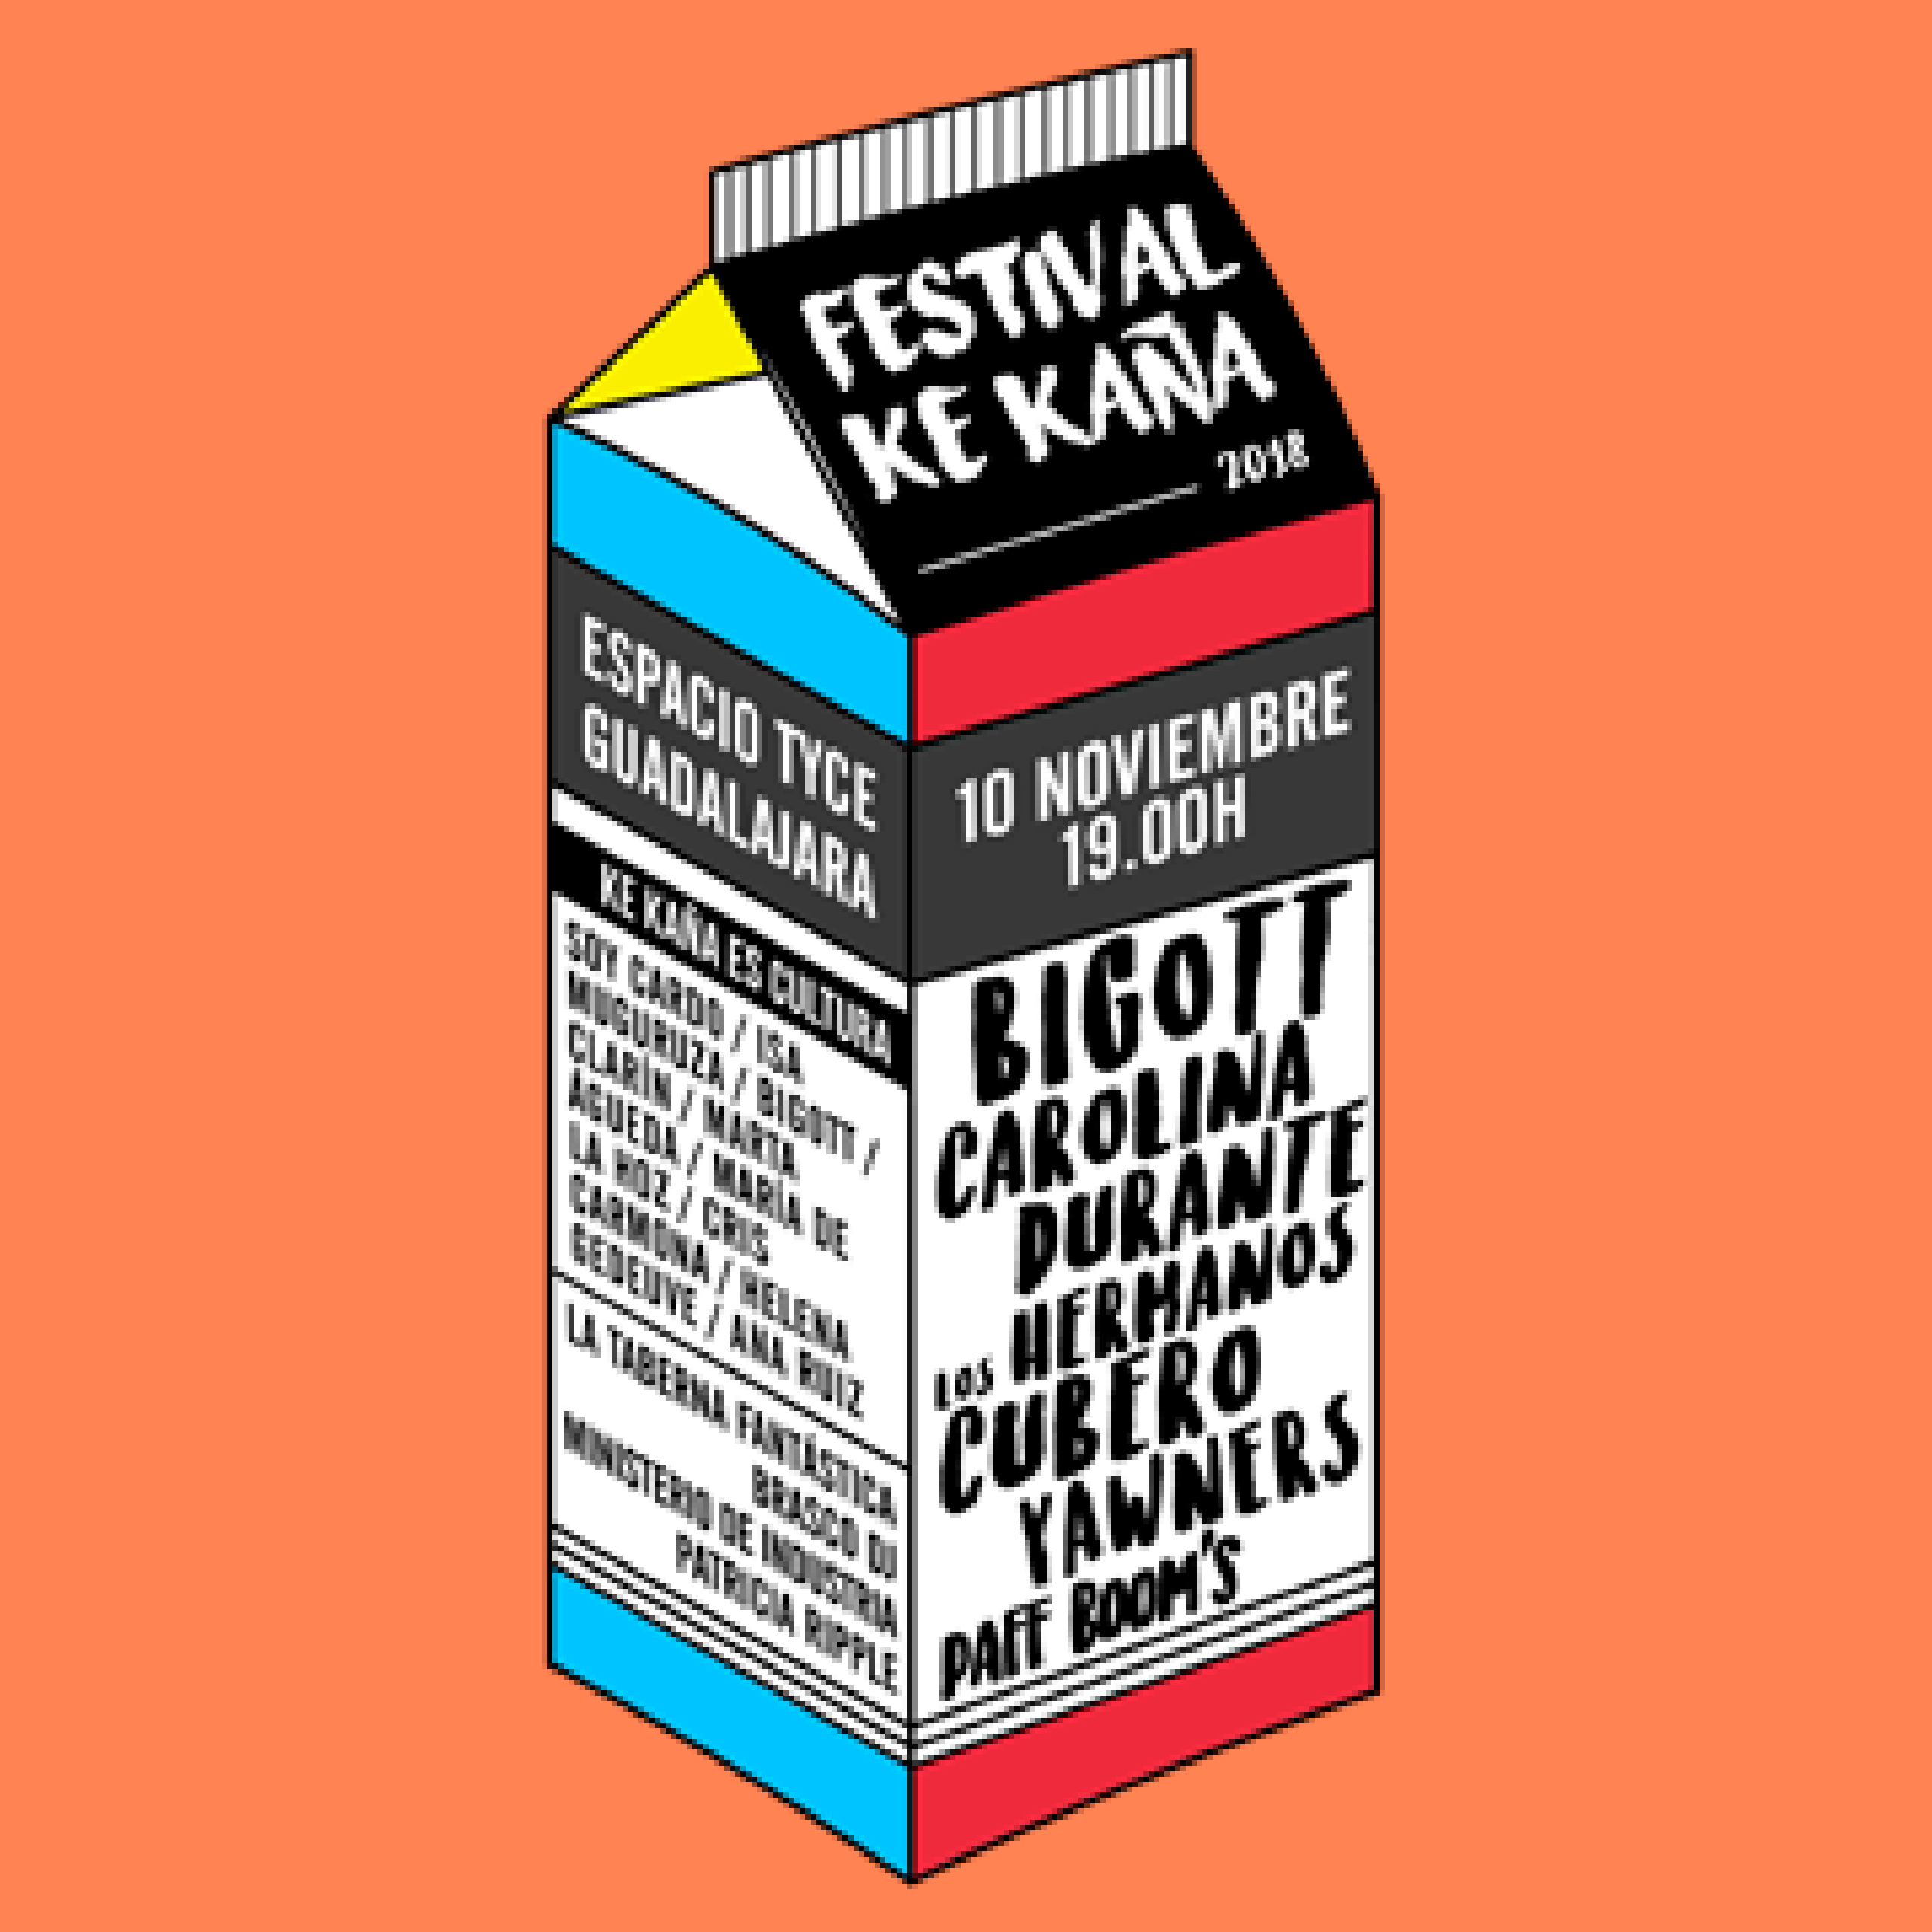 Cartel confirmaciones festival Ke Kaña 2018